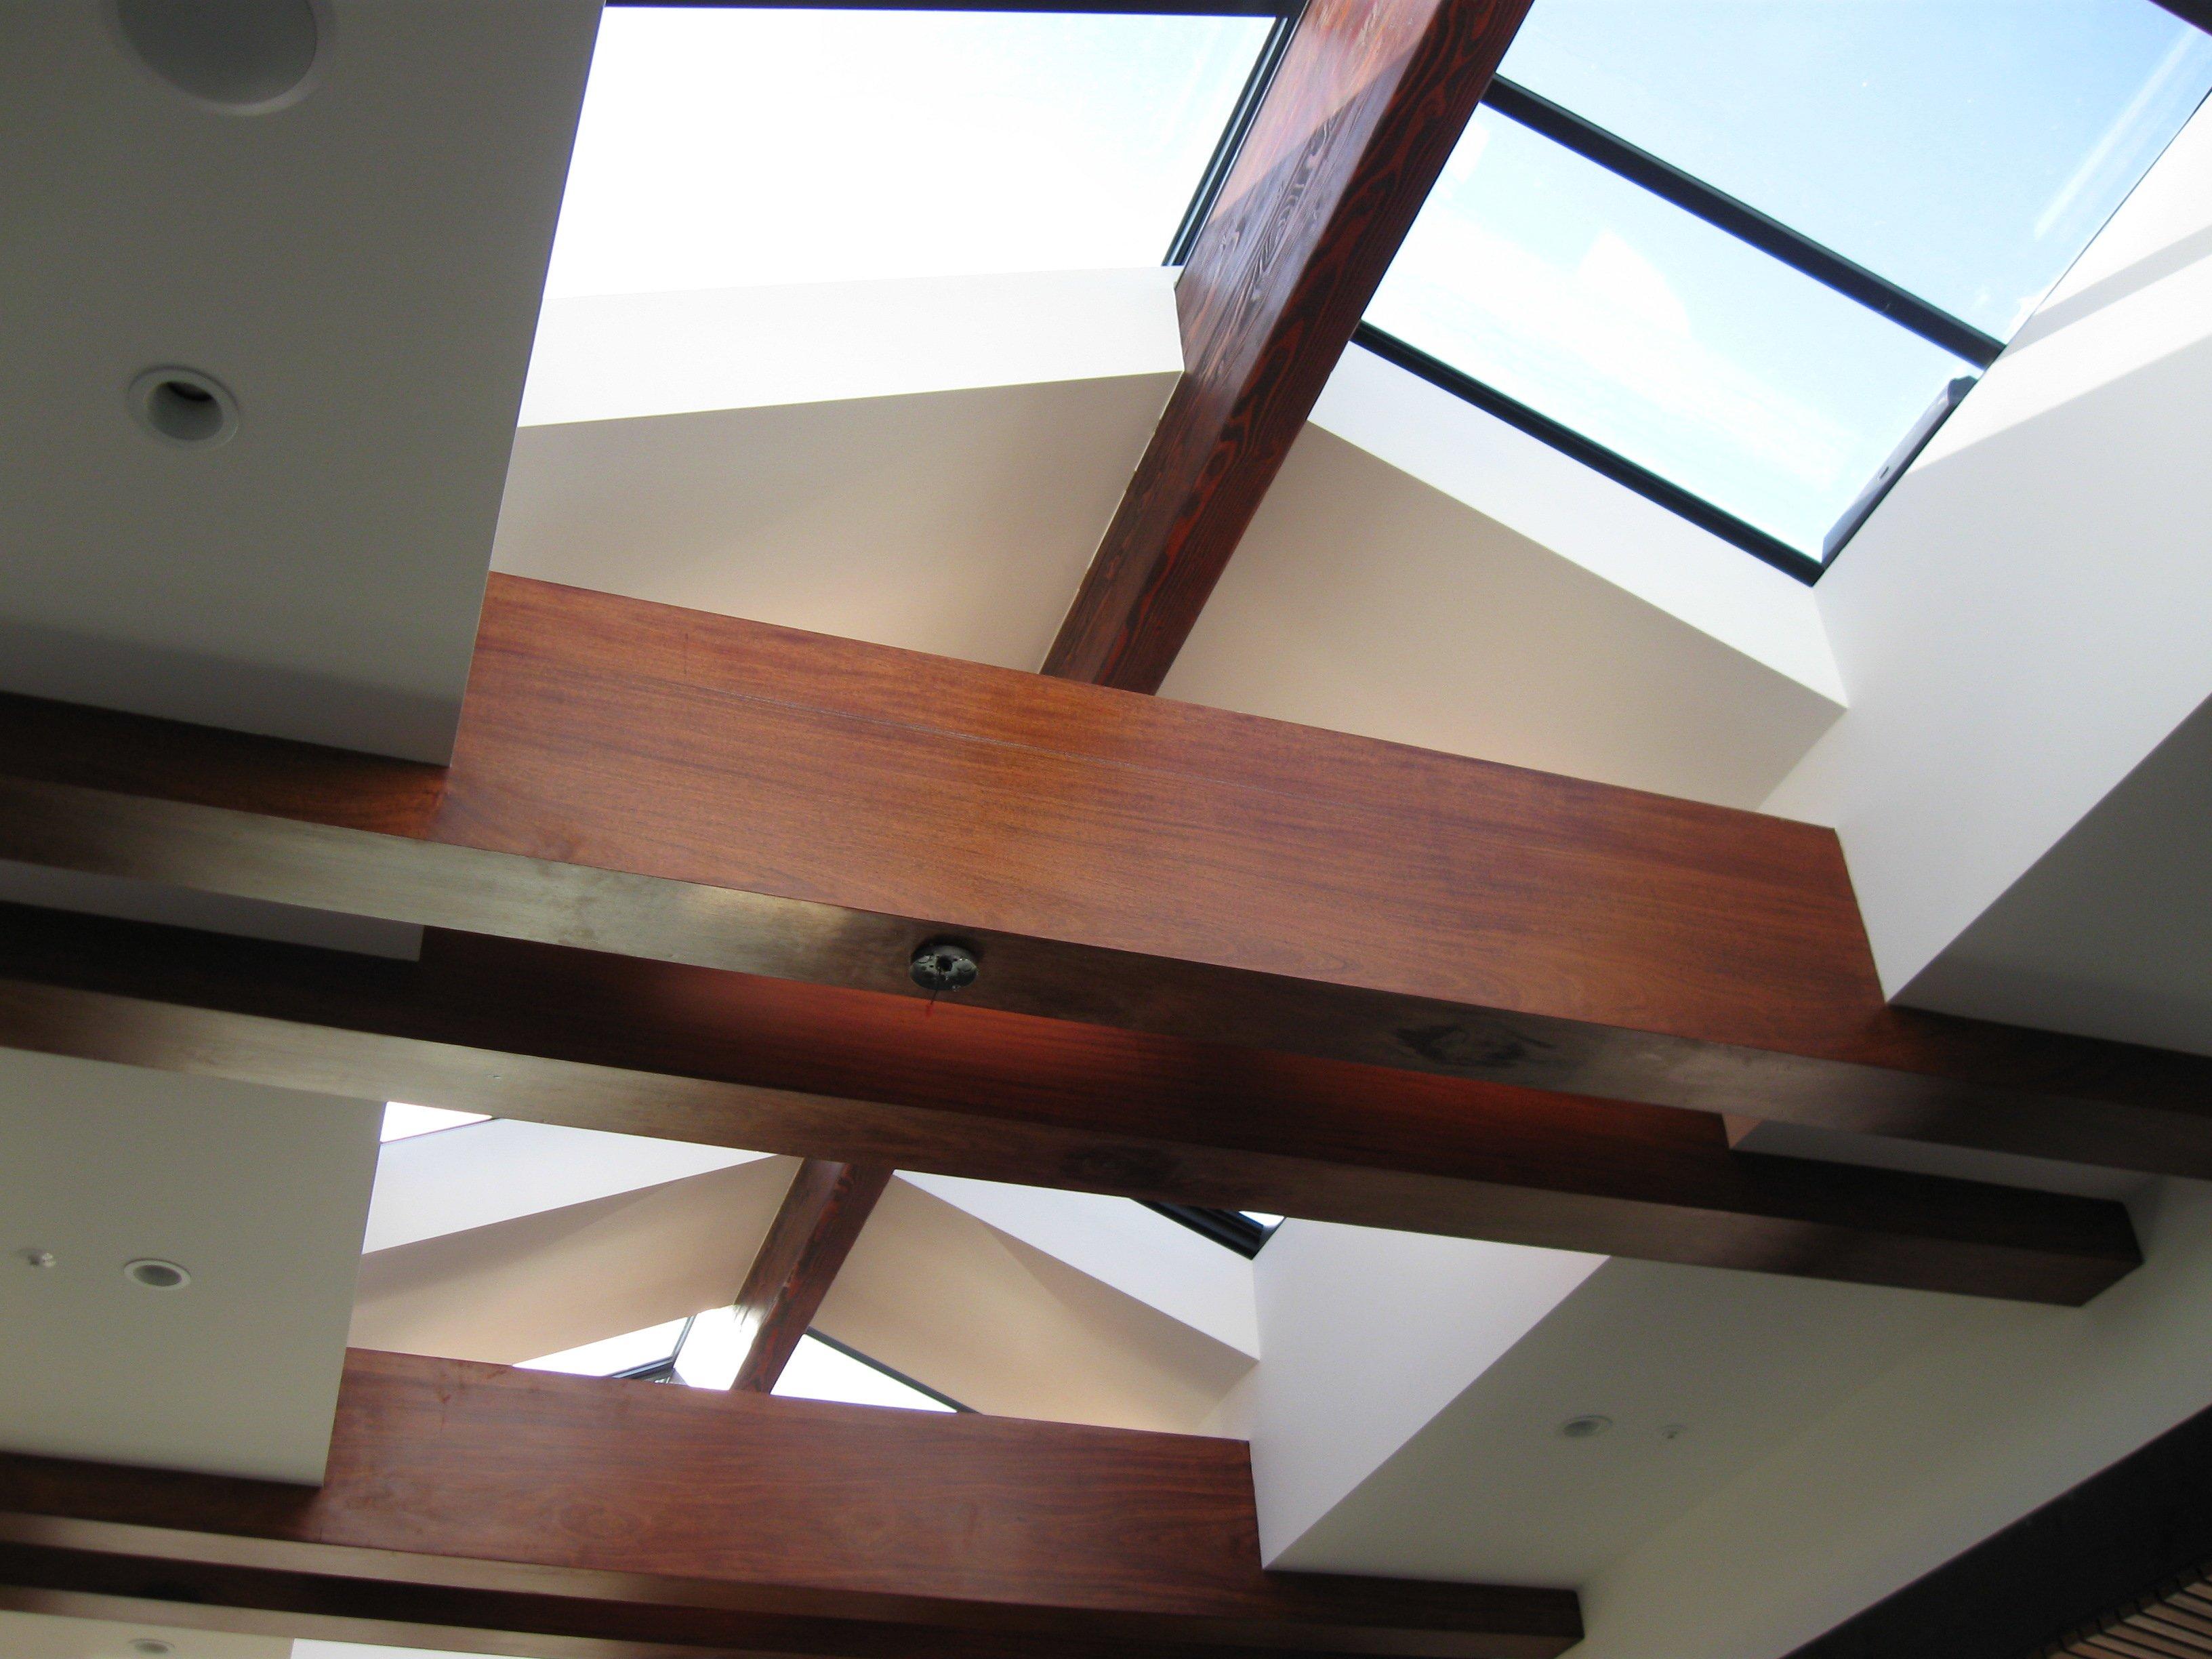 Residential skylights skyco for Skylight home